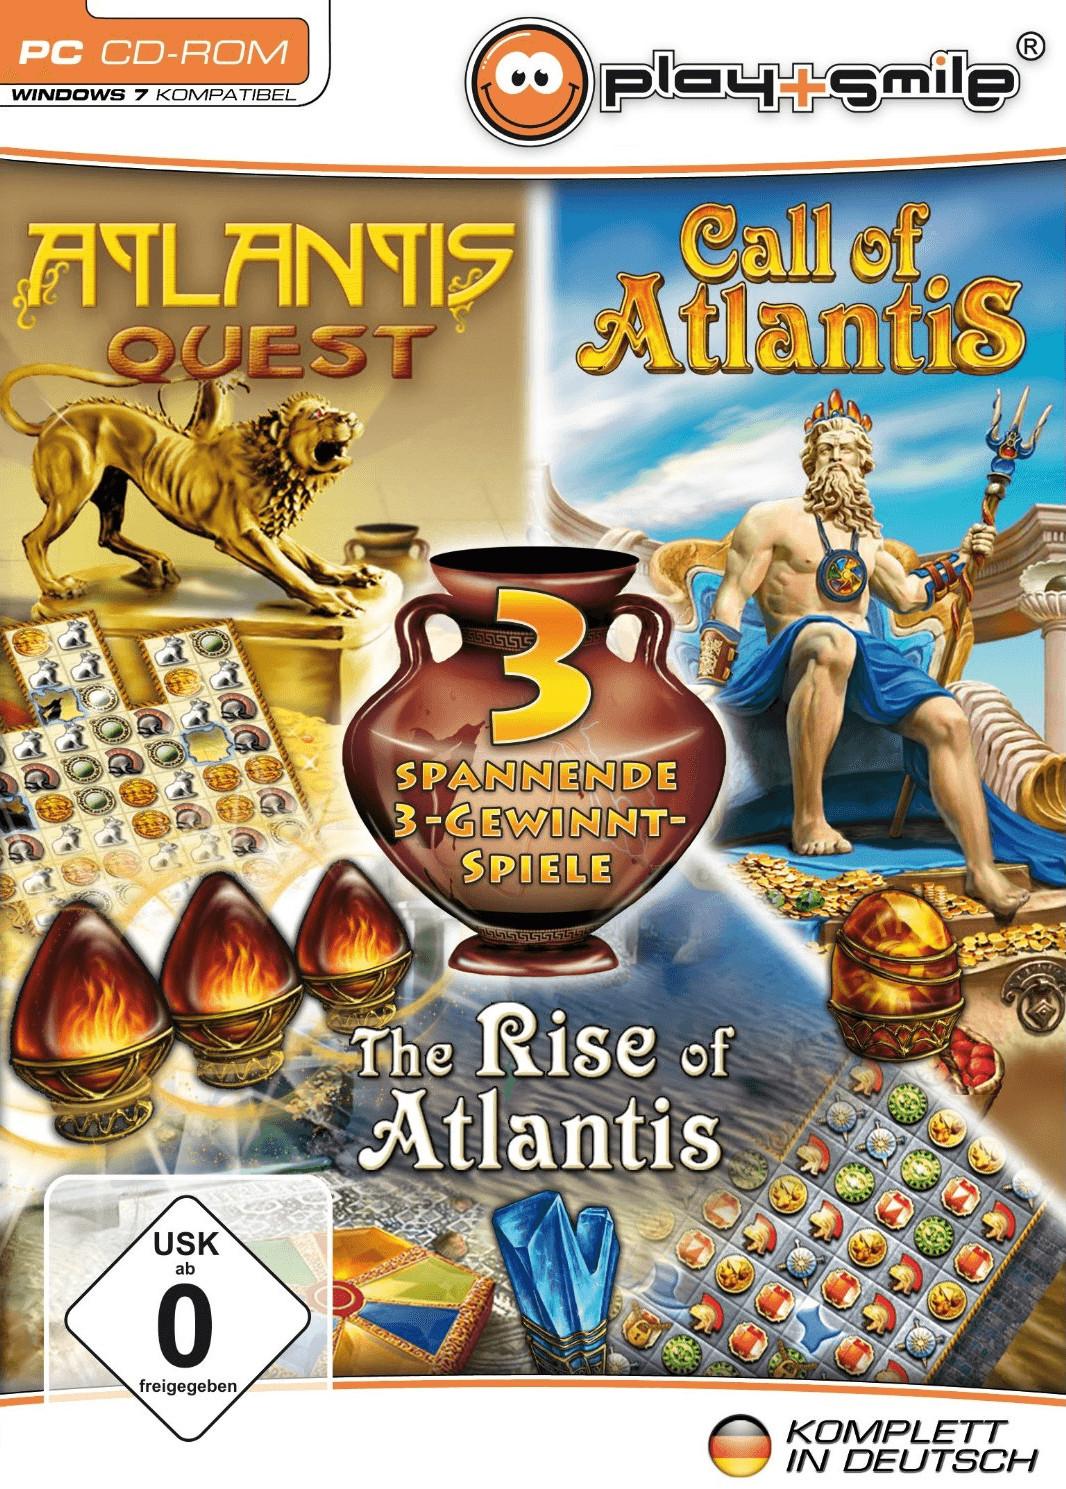 Atlantis Quest + Call of Atlantis + The Rise of Atlantis (PC)